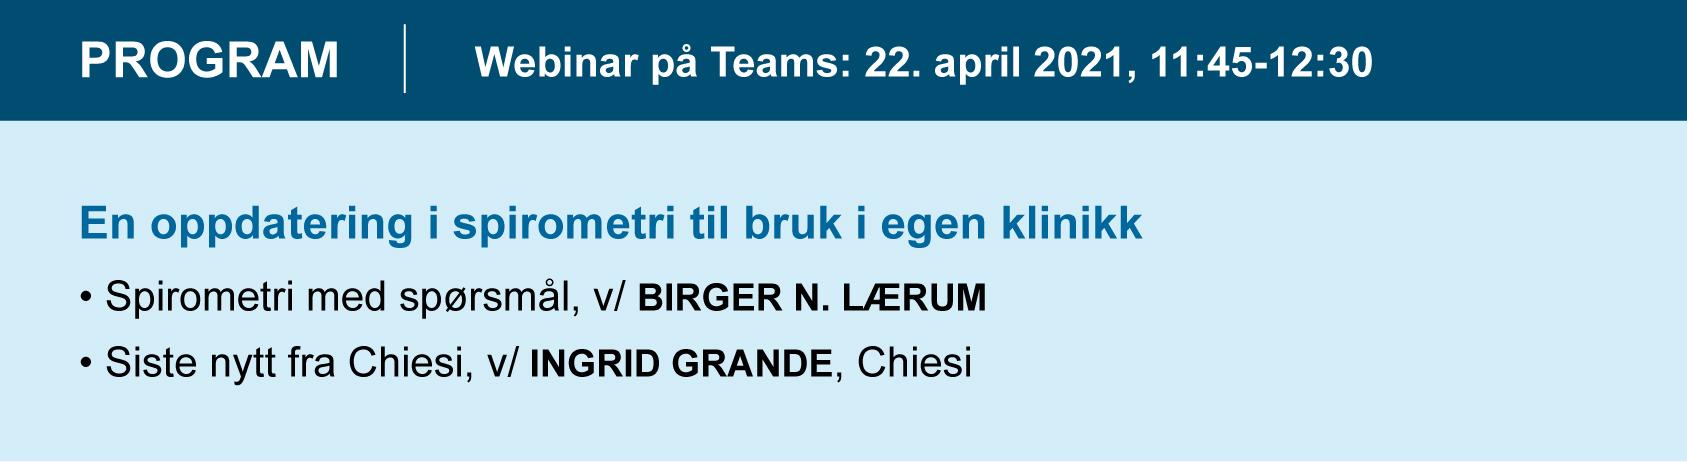 8813_chiesi_inbjudan_webinar_birger_lærum_digital_final[1]_03